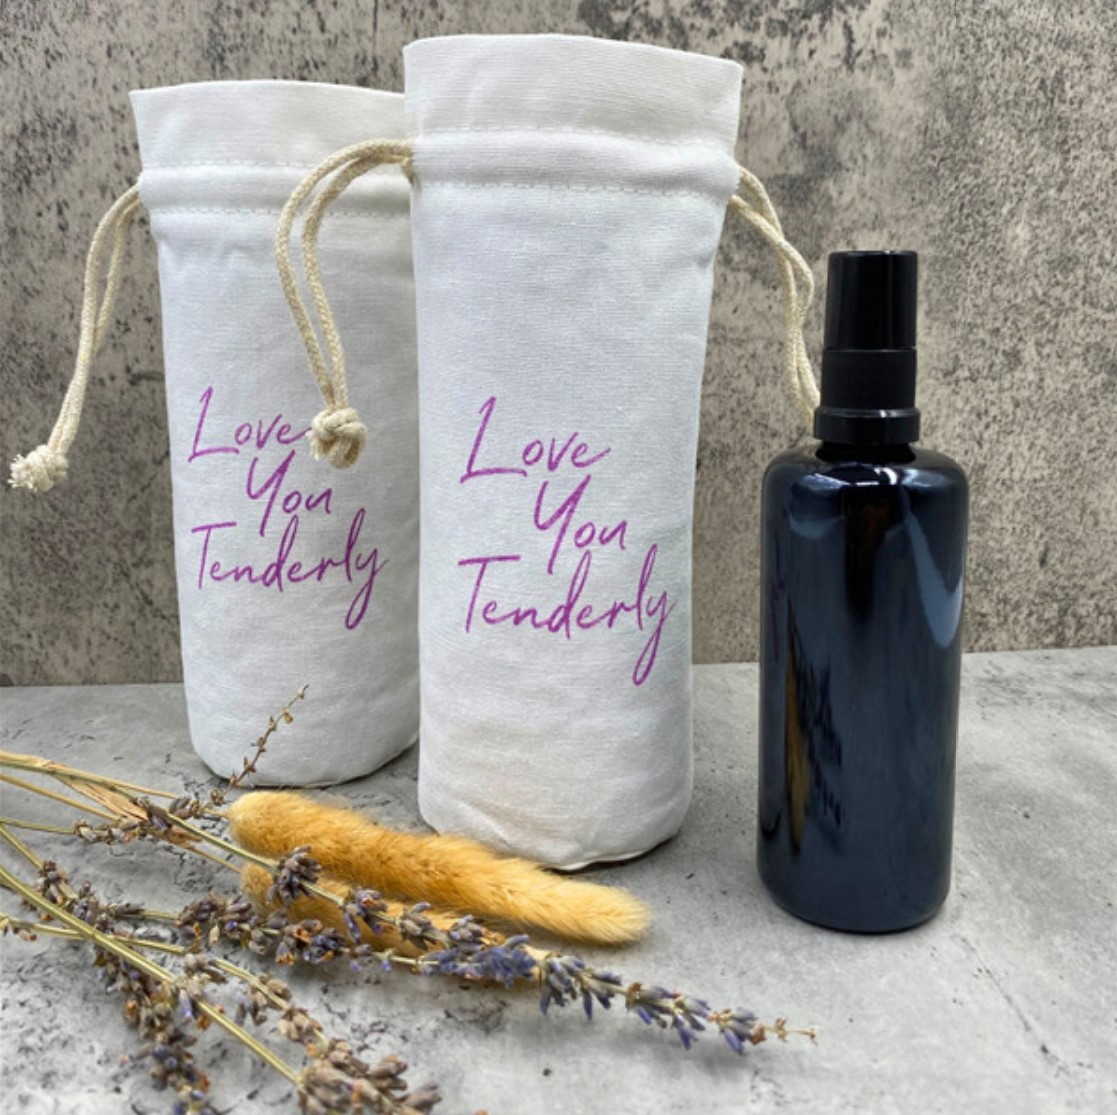 cotton drawstring bag small fabric bag filled with dried lavender flowers 10pcs=1 set-Free 2pcs- send you 12pcs